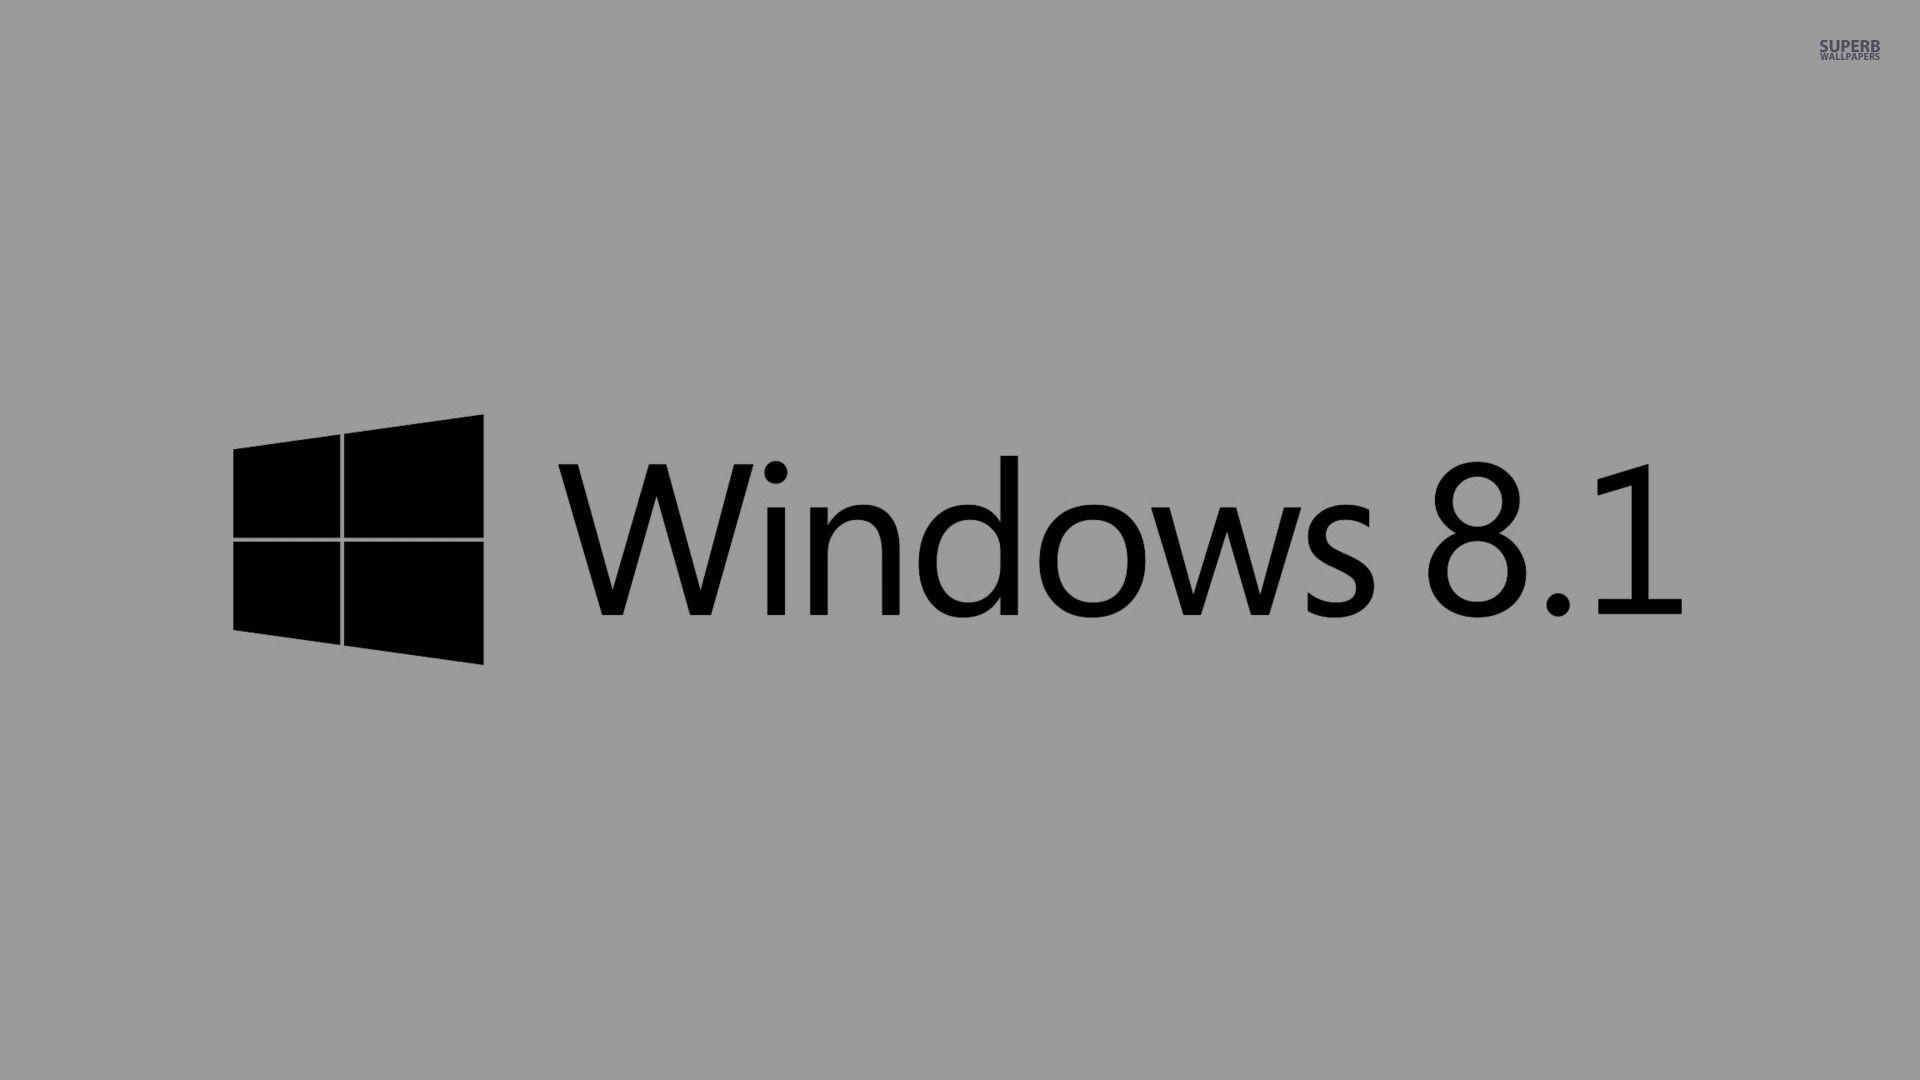 Windows 81 Wallpaper Computer Wallpapers 27778 обои